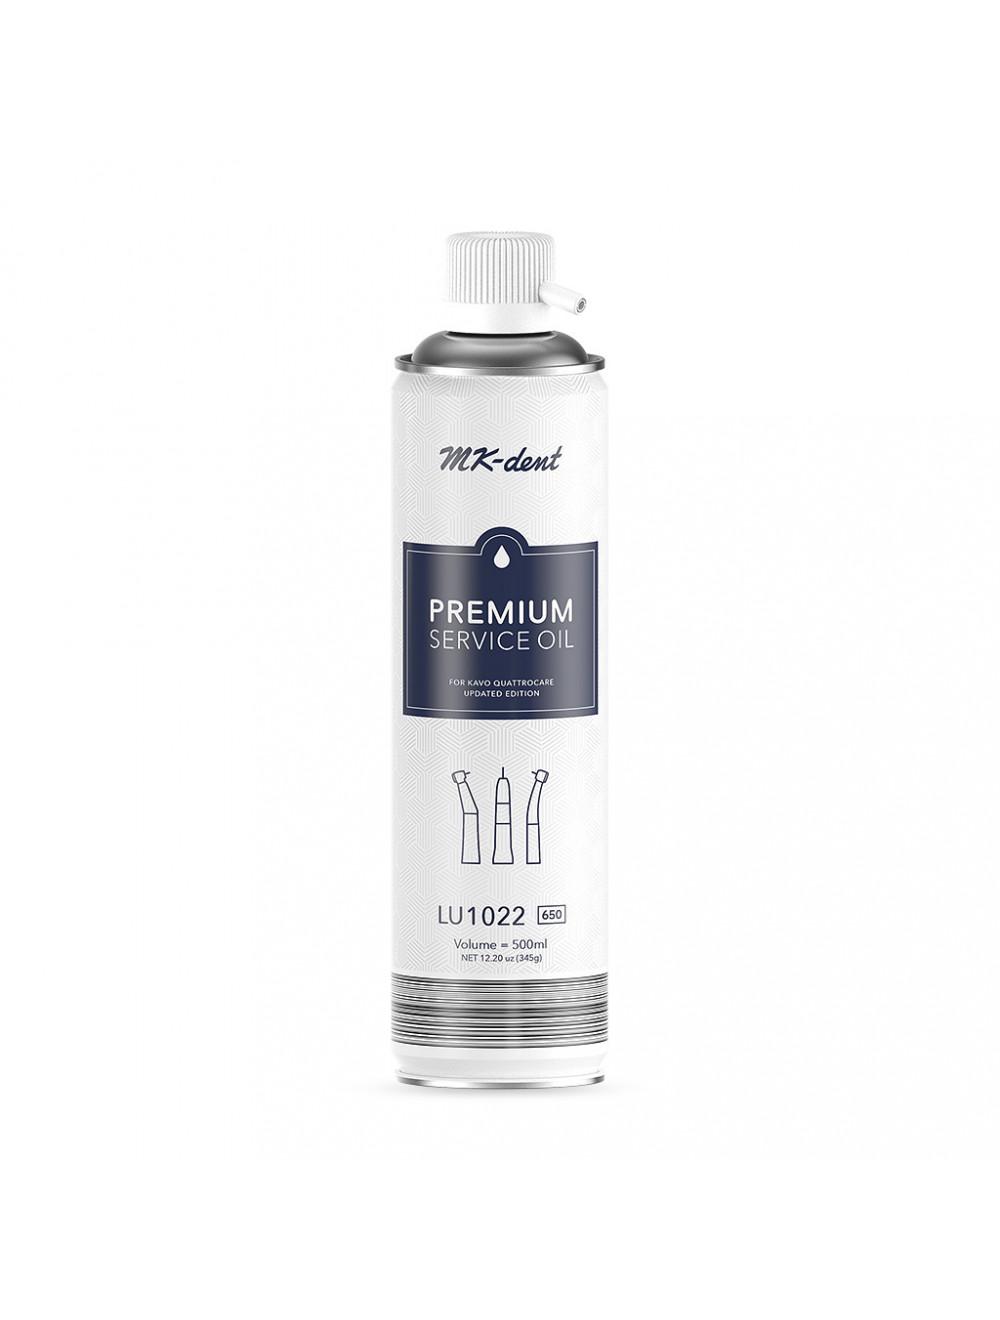 Das Produkt MK-dent Premium Service Öl LU1022 aus dem Global-dent online shop.